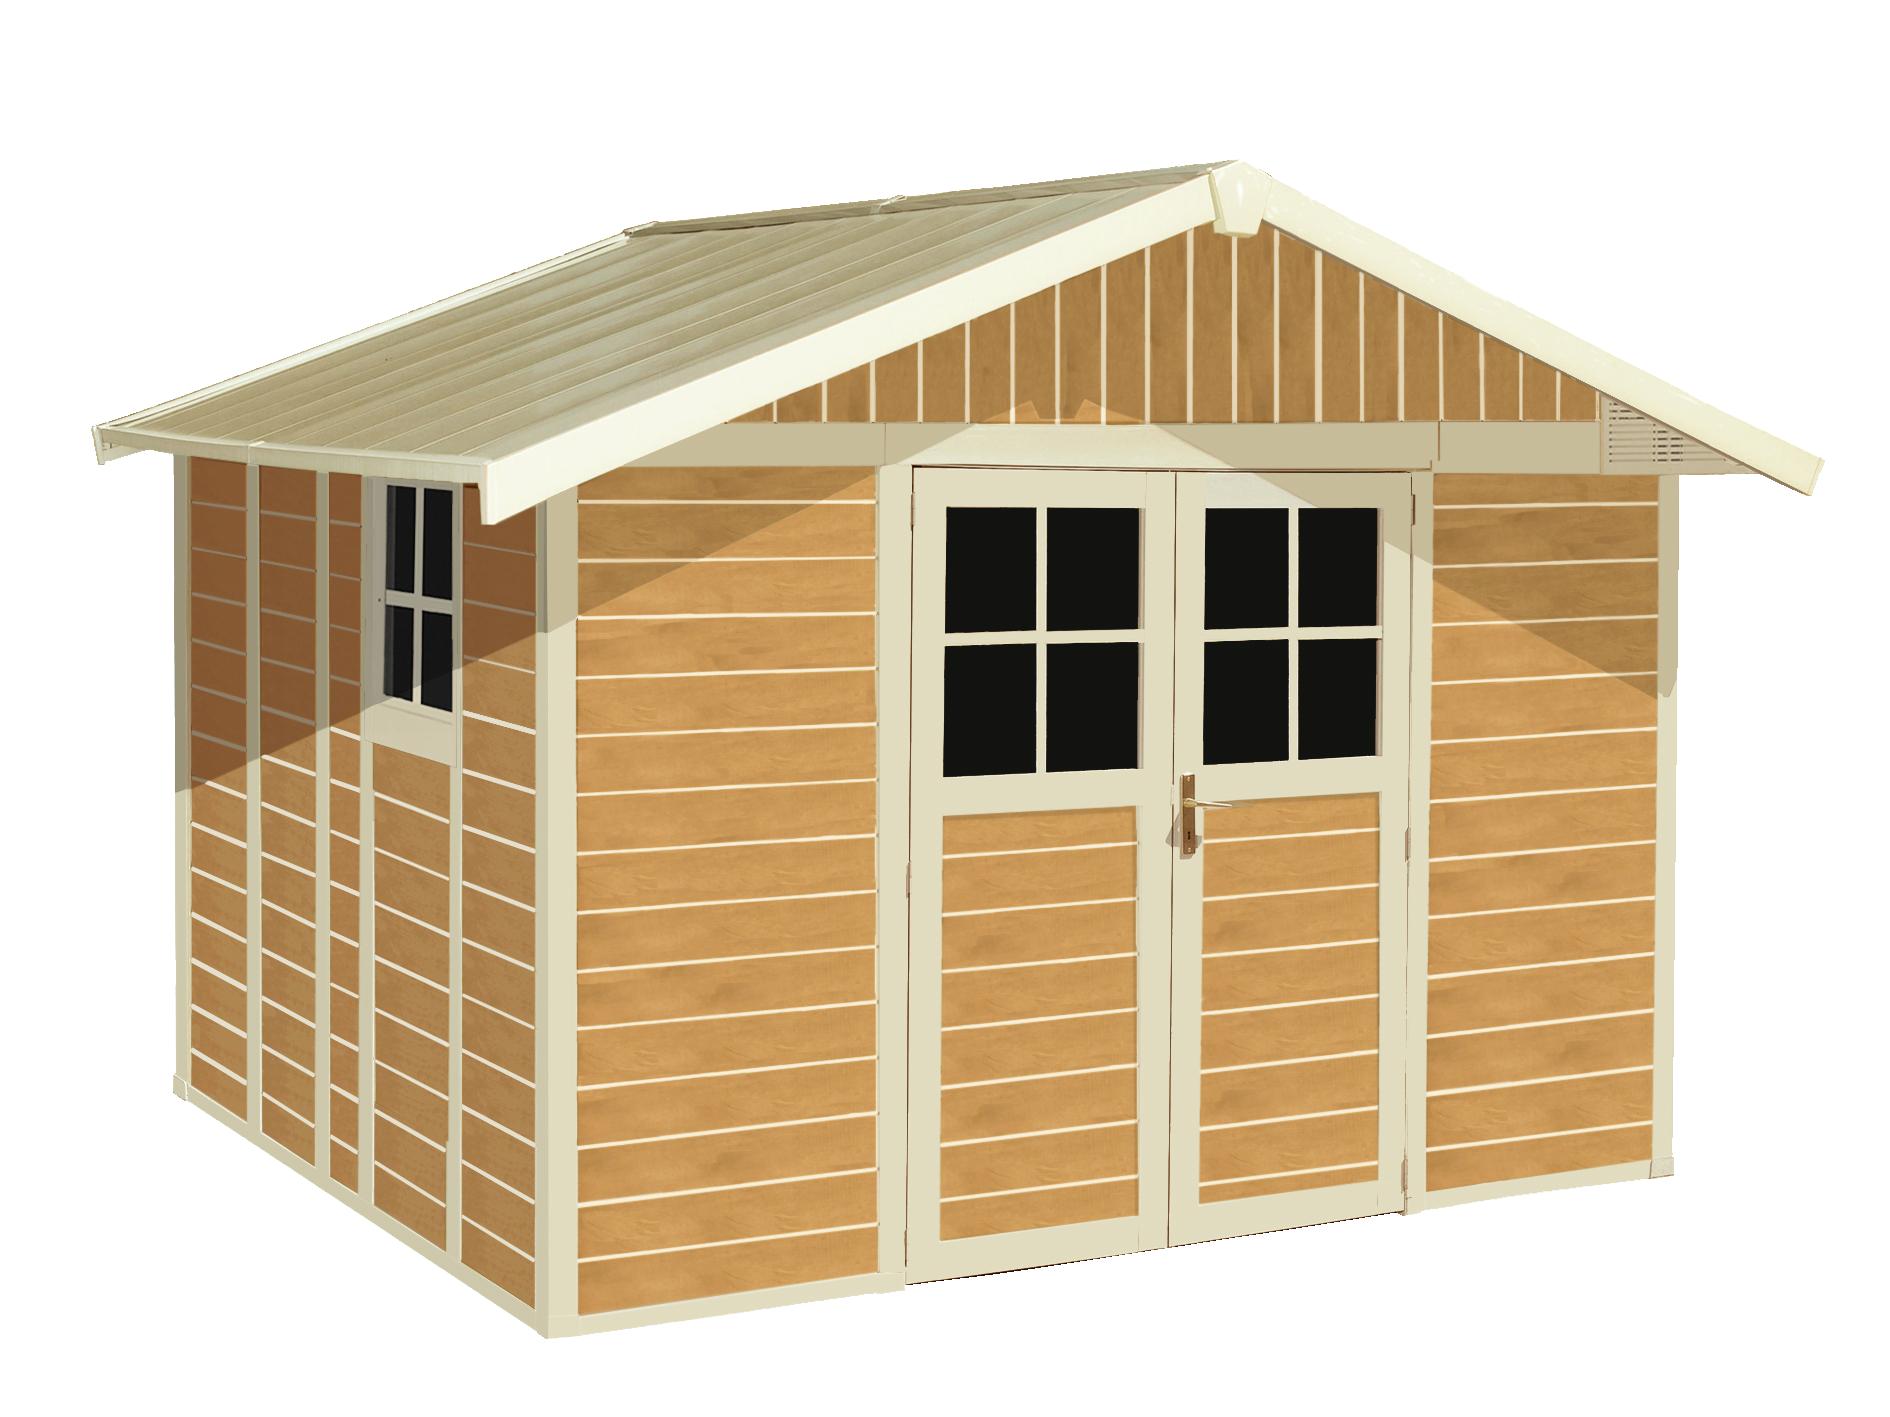 gartenhaus deco sherwood 11 m grosfillex. Black Bedroom Furniture Sets. Home Design Ideas